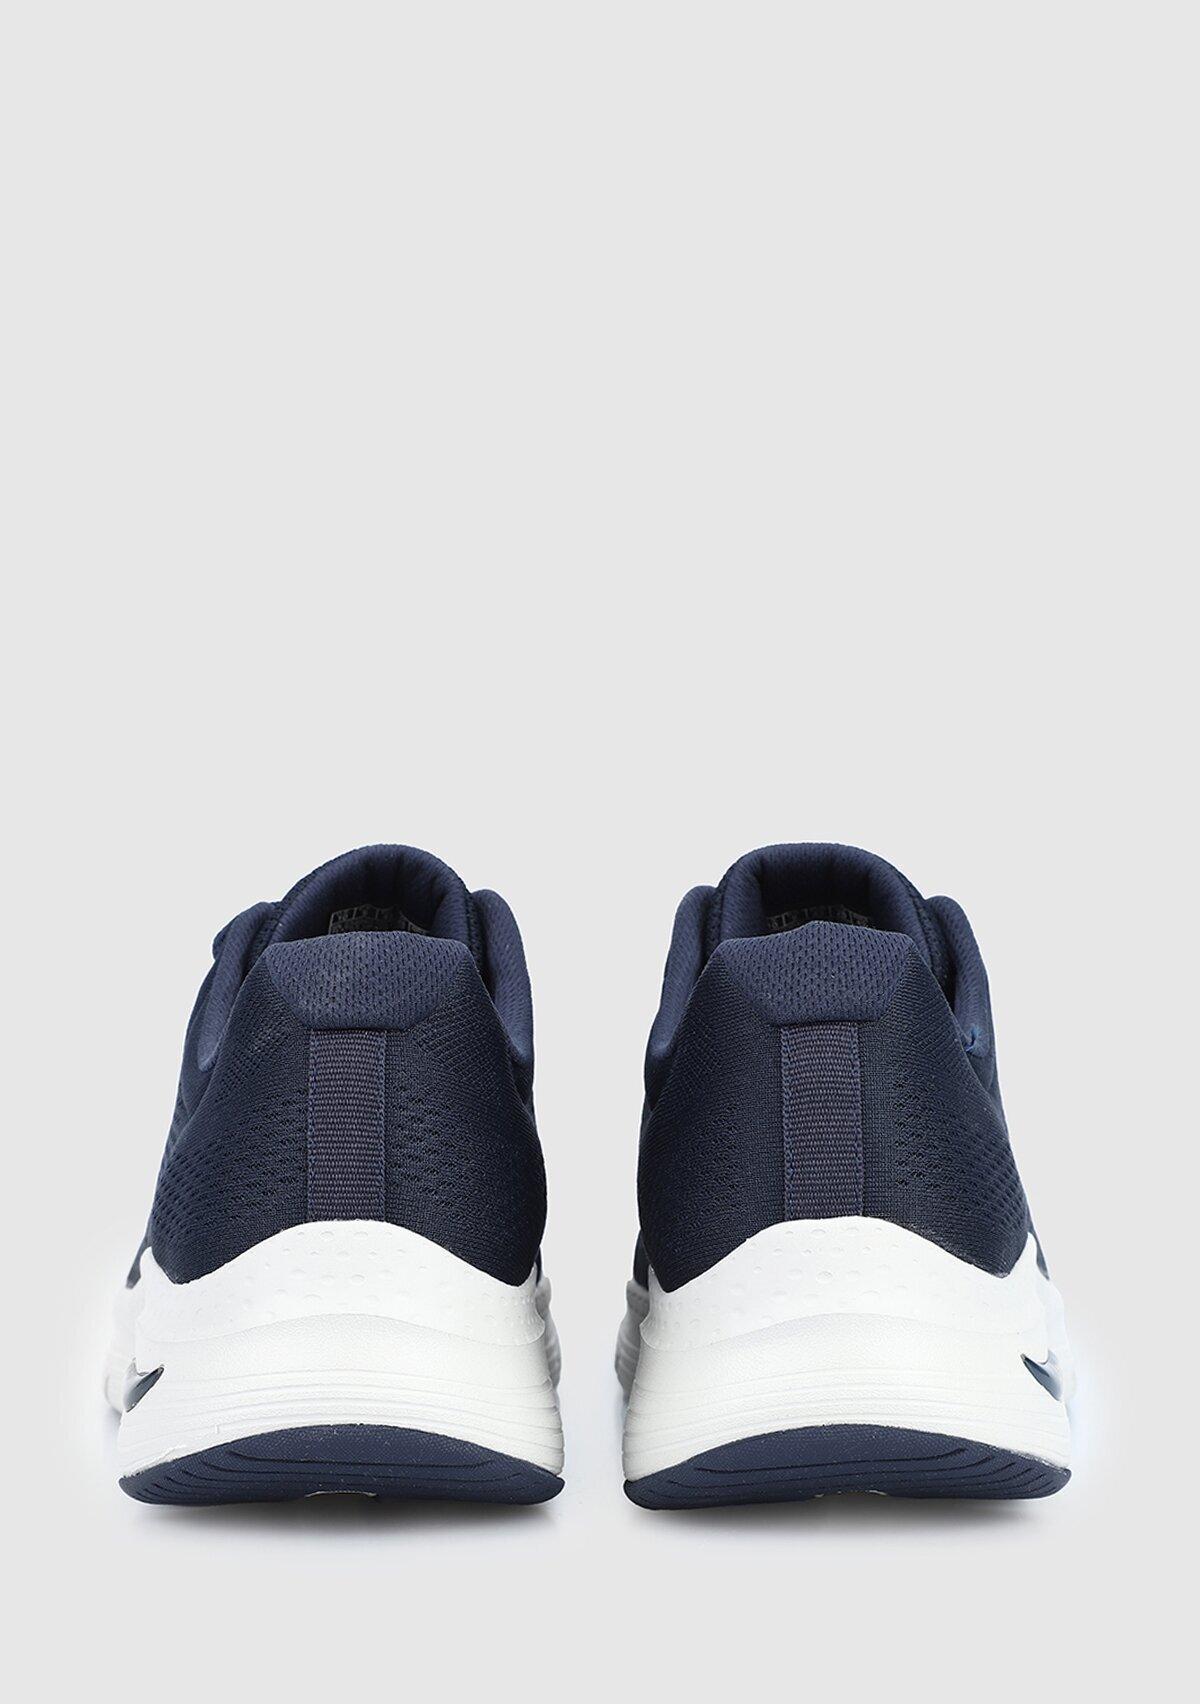 resm Arch Fit Lacivert Erkek Sneaker 232040Nvy